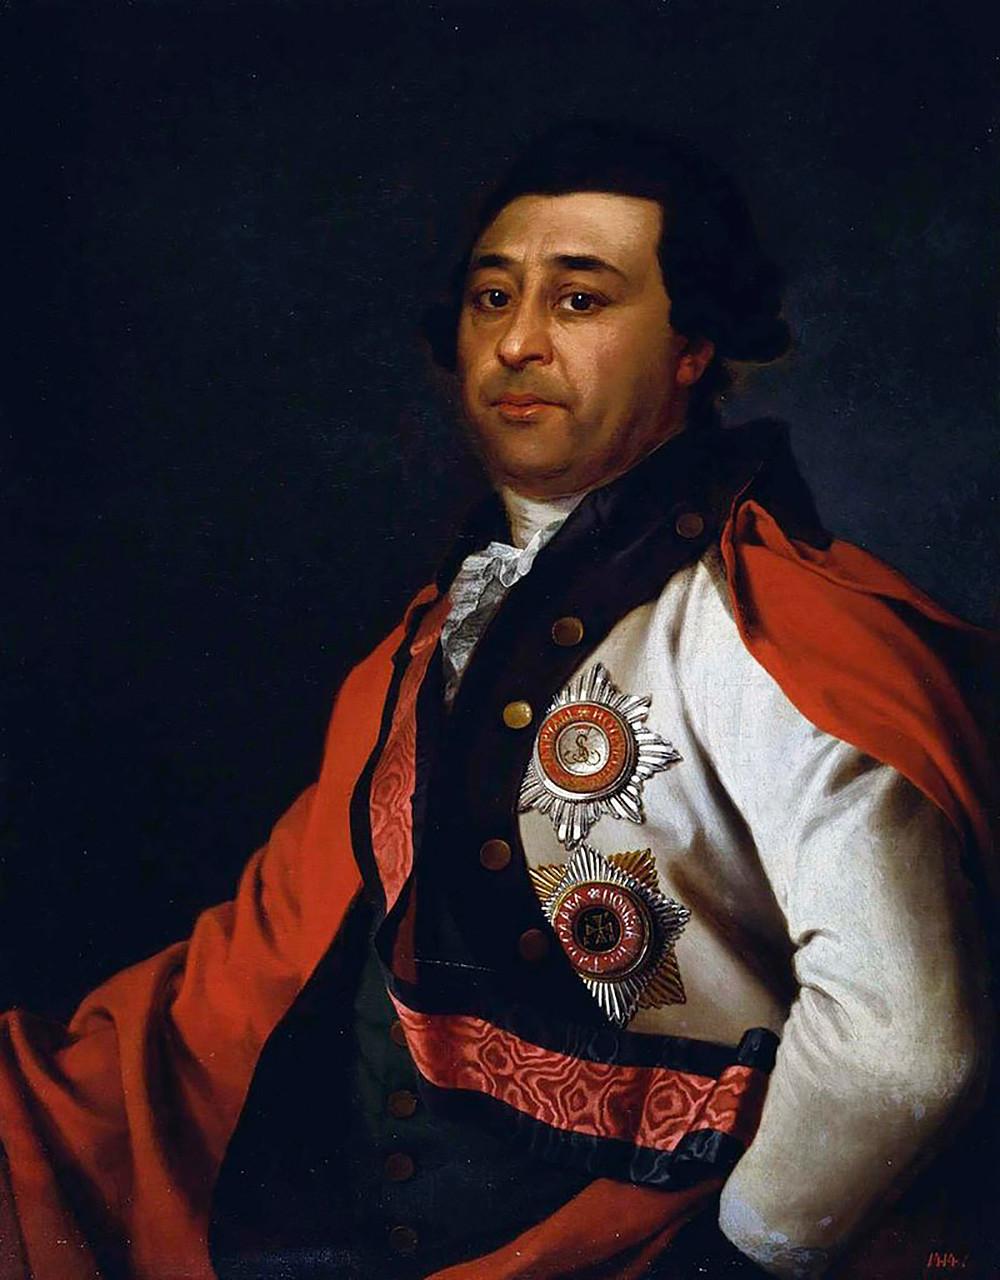 'Retrato de Ivan Hannibal, filho de Abram Hannibal', de Dmítri Levitski